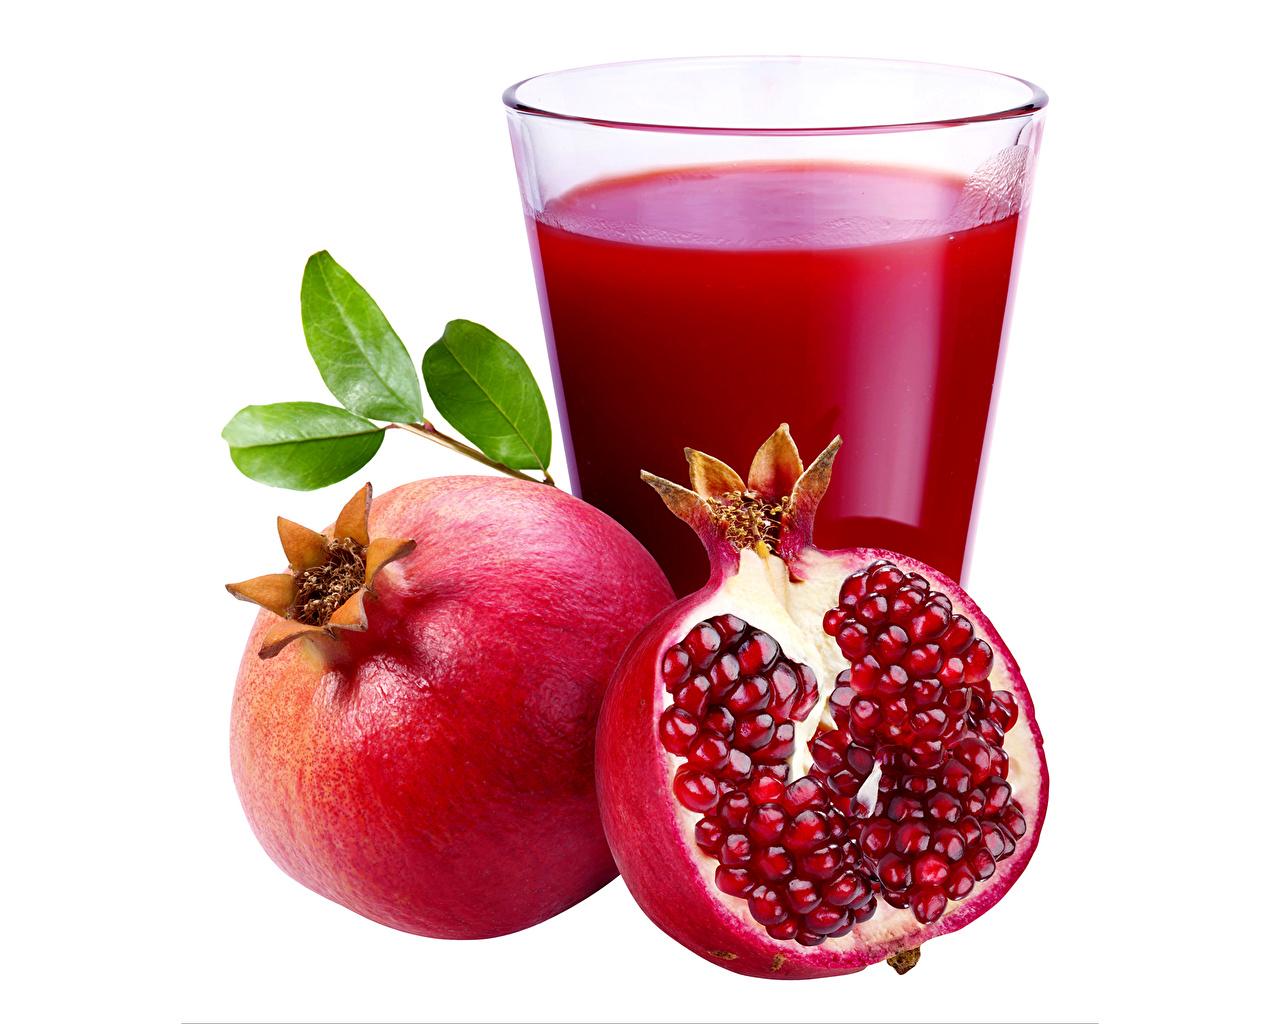 Фото Сок Гранат Стакан Пища Напитки стакане стакана Еда Продукты питания напиток